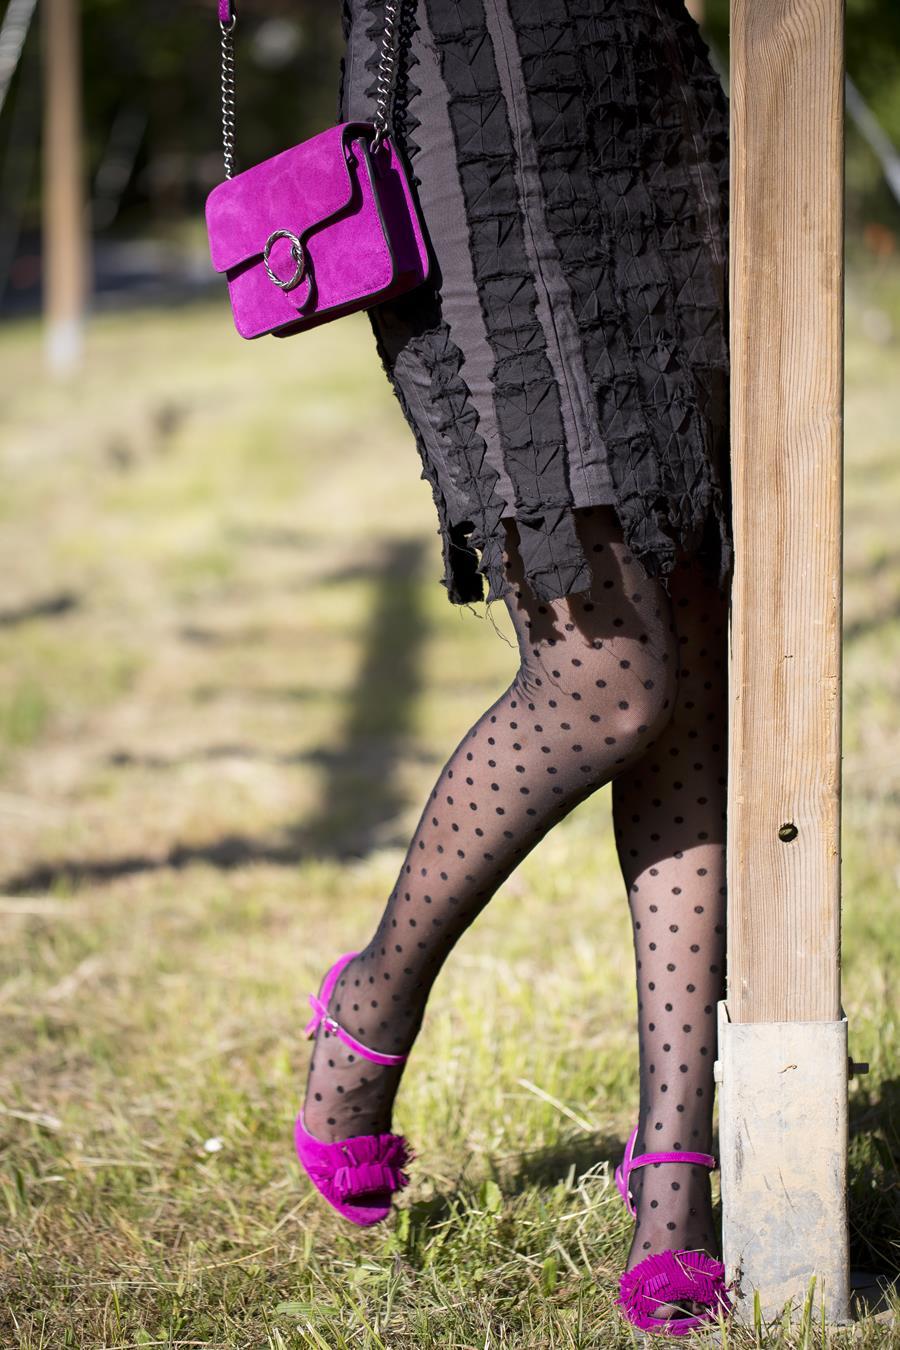 Rebeca Valdivia, personal shopper, Donostia, San Sebastián, Miss Clov, origami dress, vestido origami, sandalis tacón, boho, flecos, frills sandals, Iñaki Kilate, origami, papiroflexia, bolso bandolera, bag, curls, rizos, curlpower